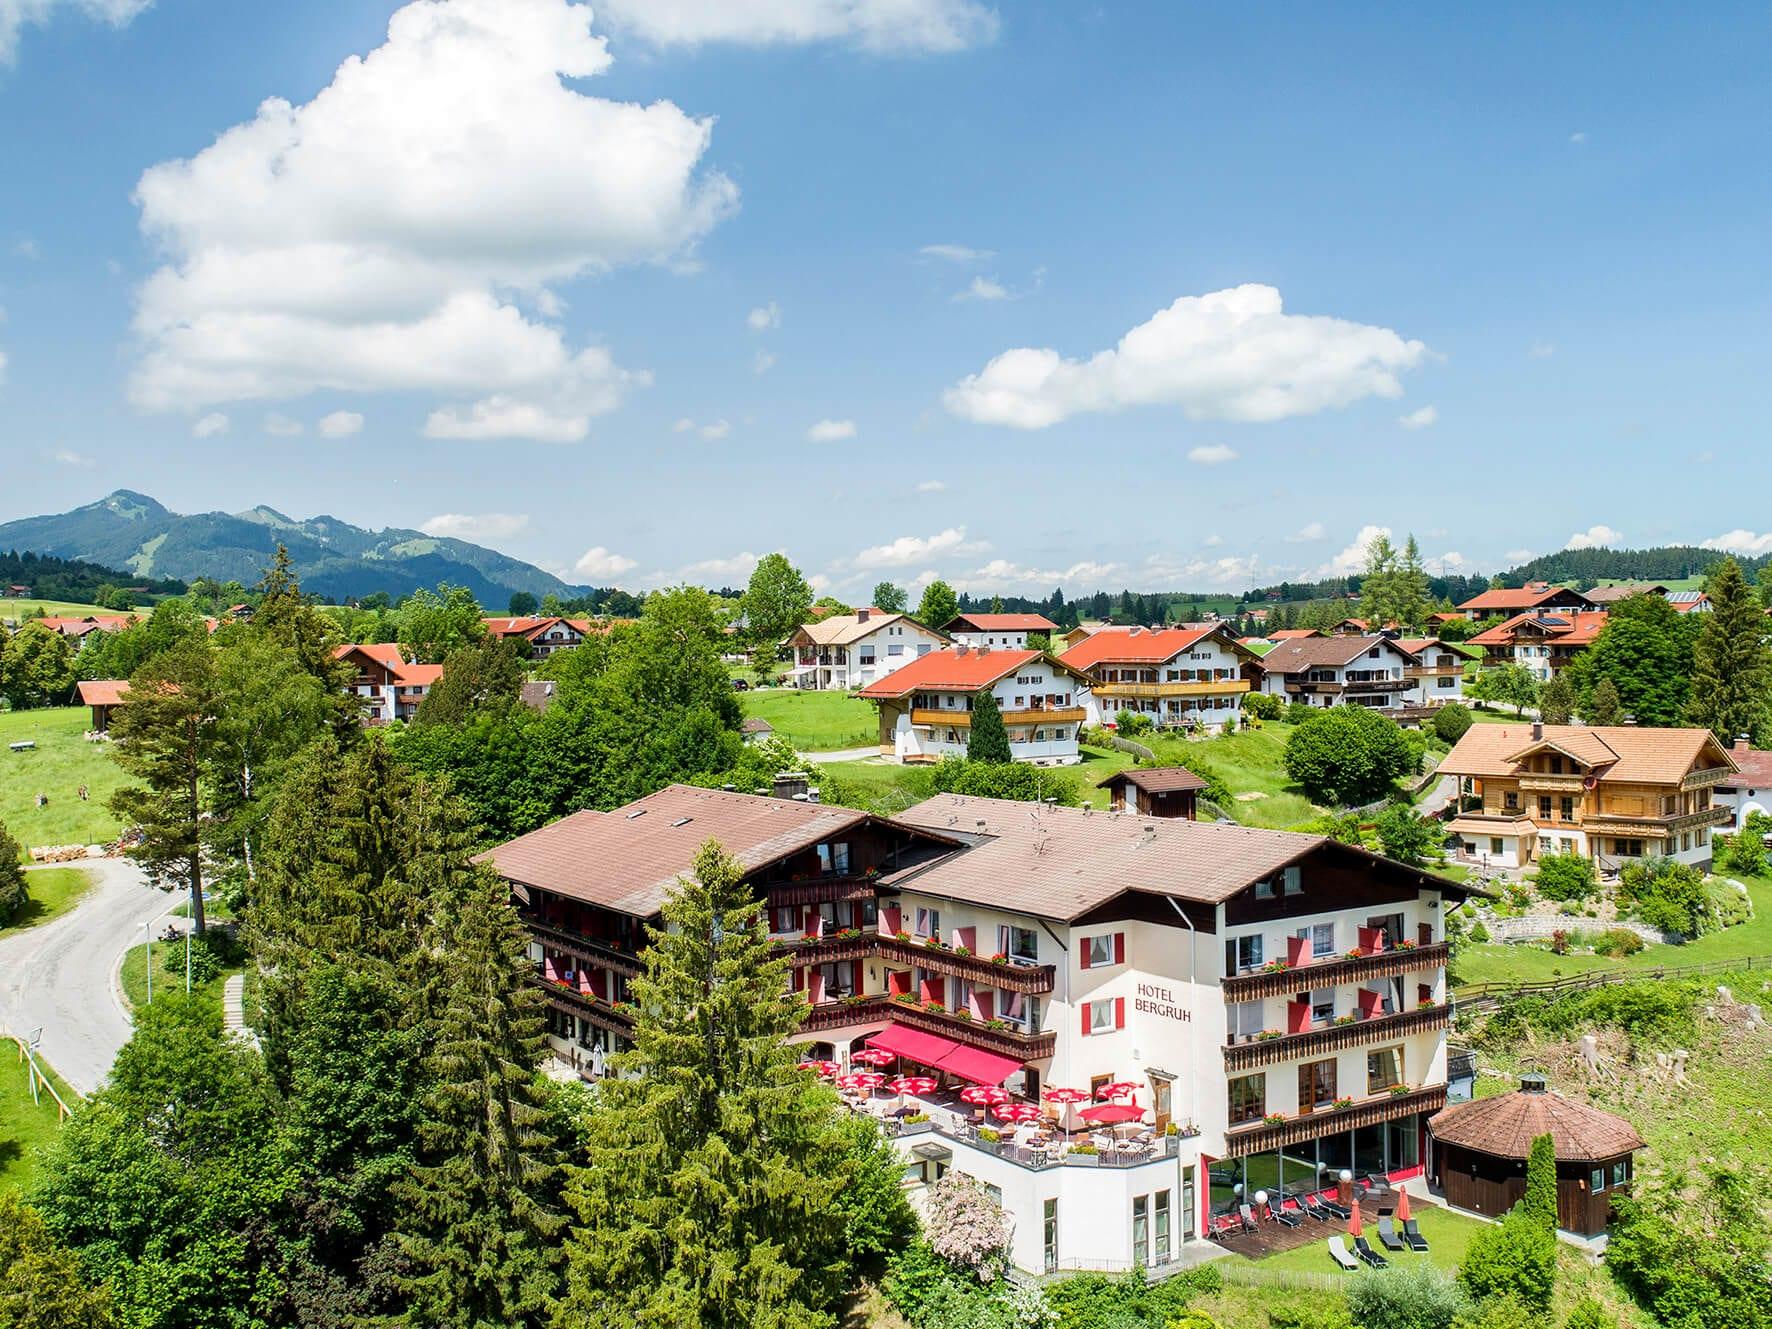 Hotel Bergruh, Weissensee